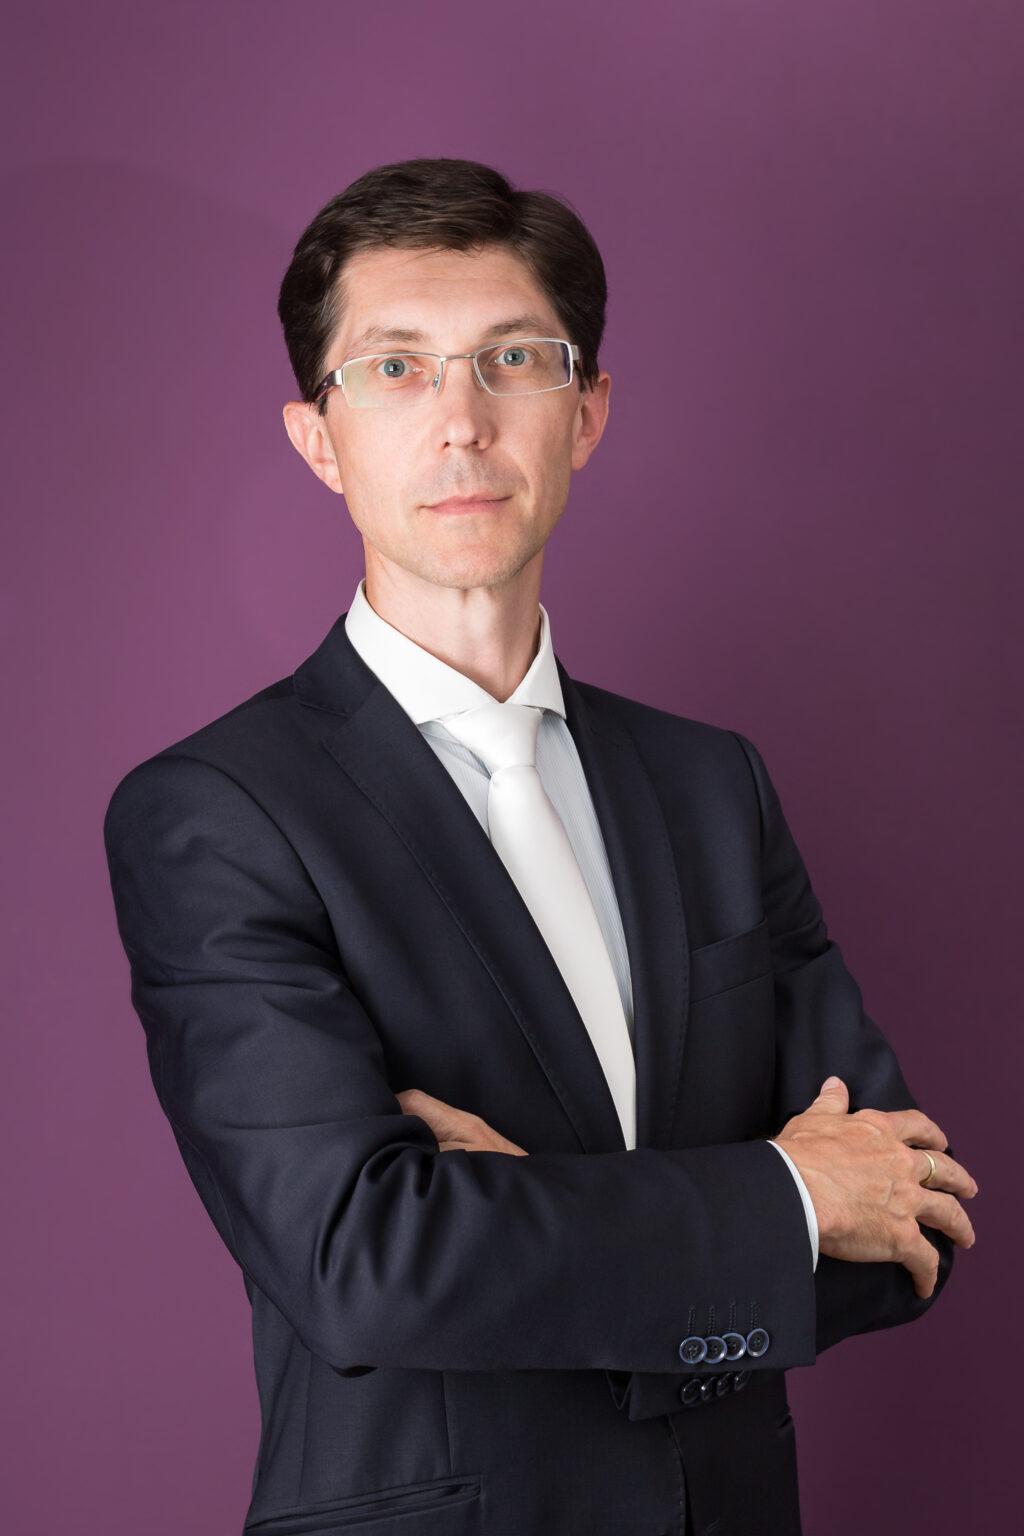 JUDr. Marek Hudec